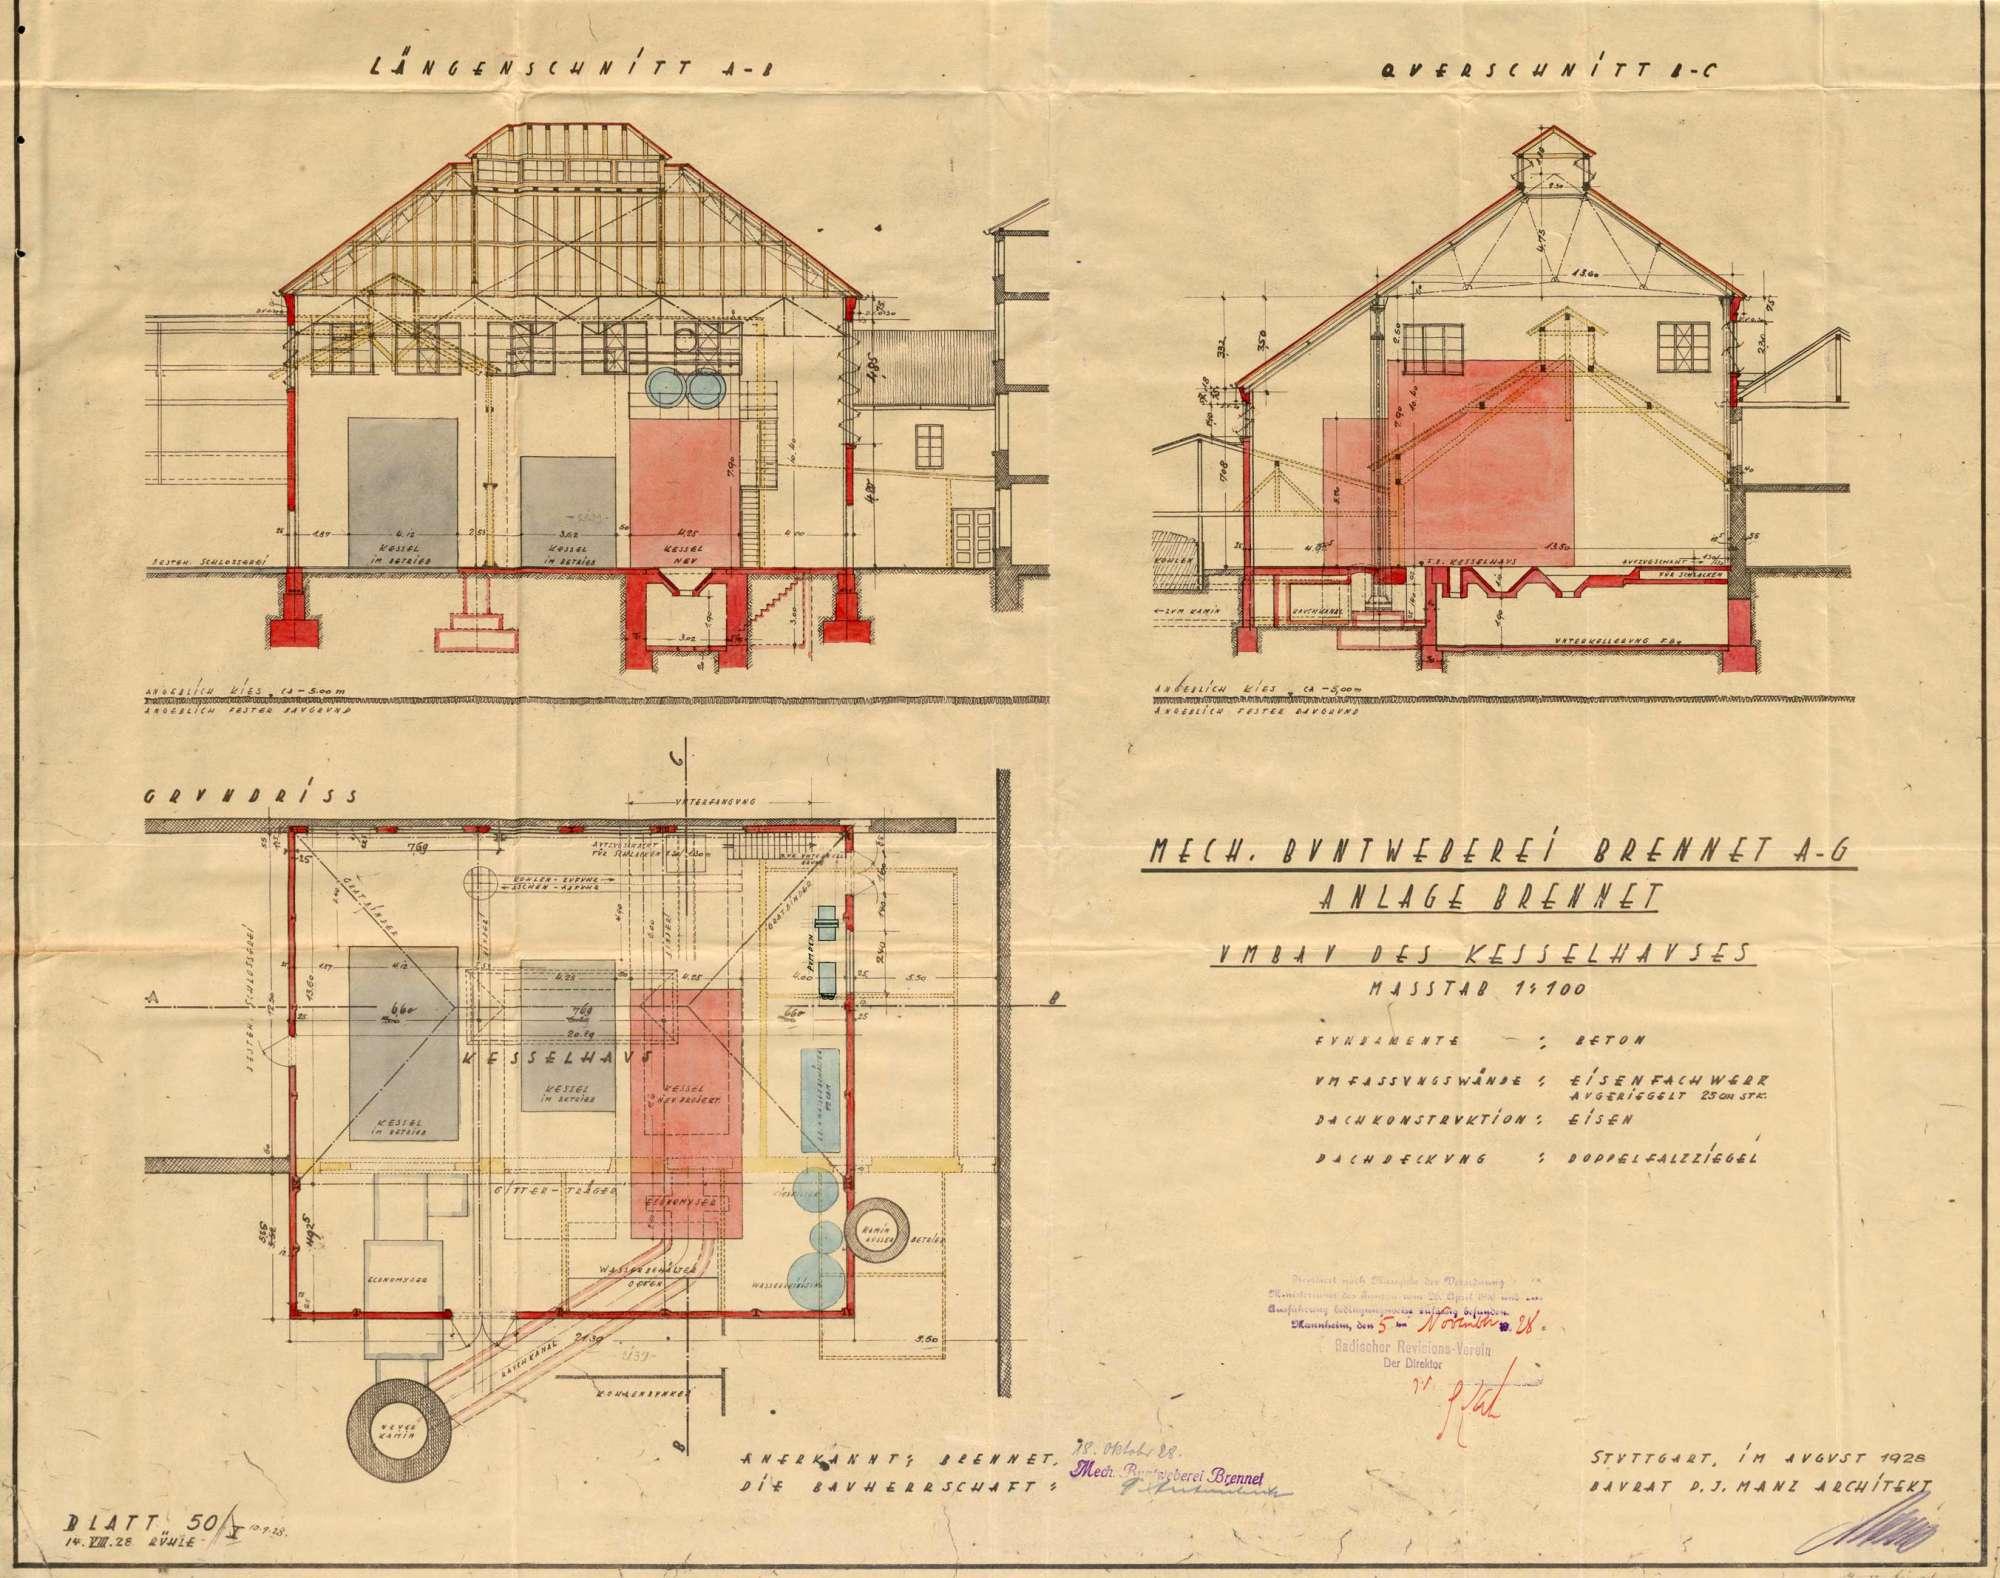 Dampfkessel der Firma C. A. Hipp & Co., Mechanische Buntweberei Brennet, in Öflingen, Bild 2